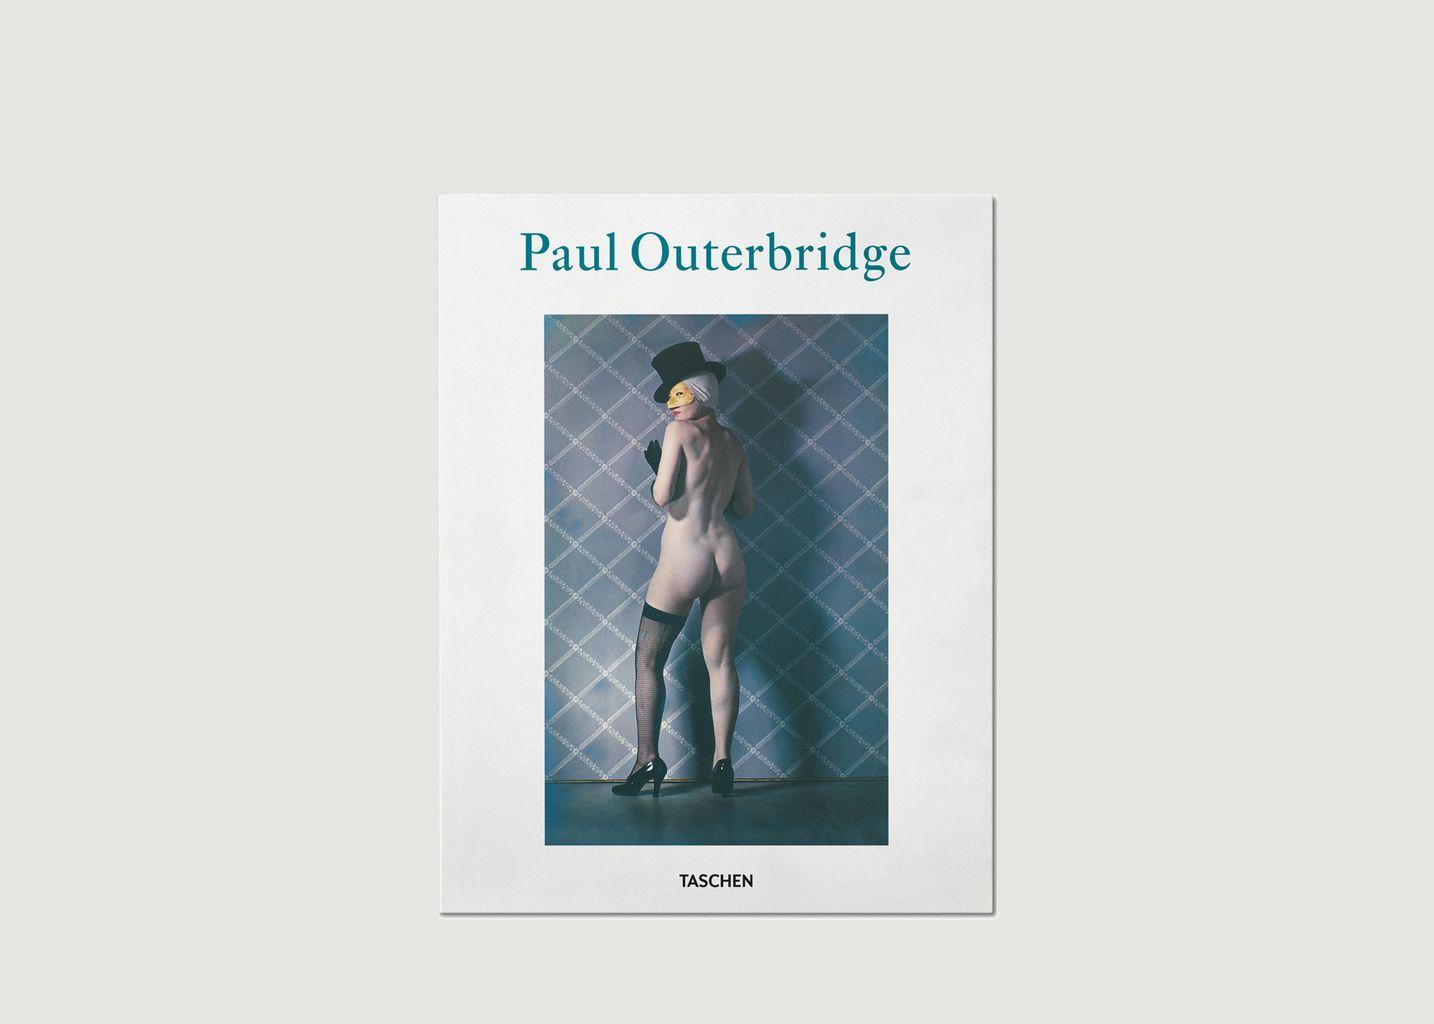 Paul Outerbridge - Taschen